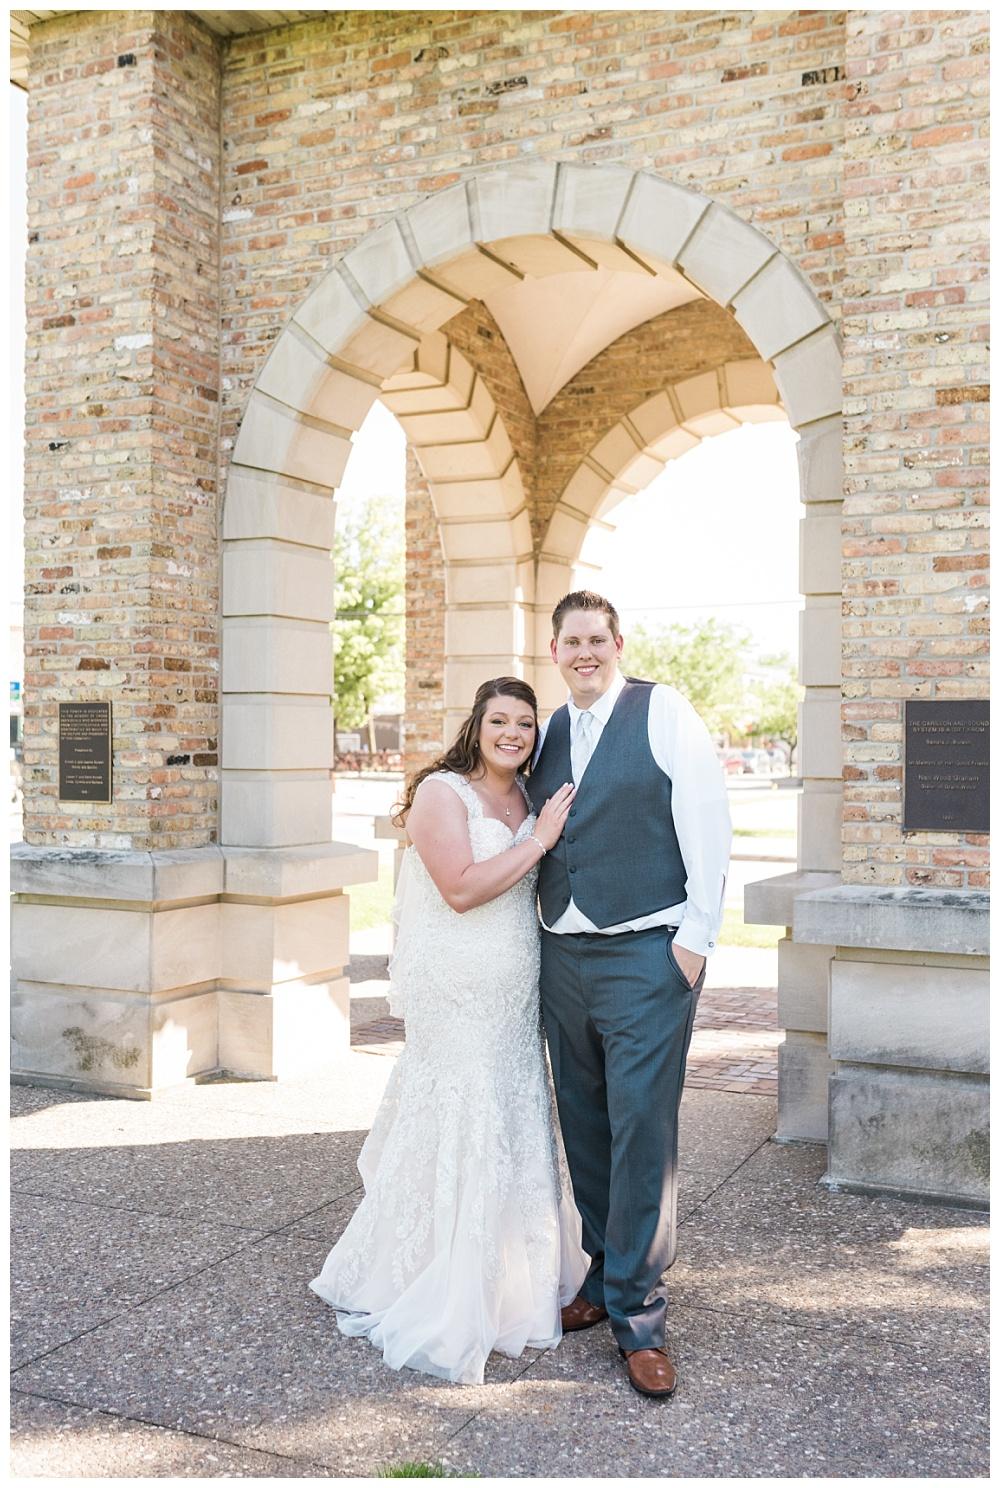 Stephanie Marie Photography Eastbank Venue and Lounge Cedar Rapids Iowa City Wedding Photographer Kelsey Austin Boekhoff_0003.jpg